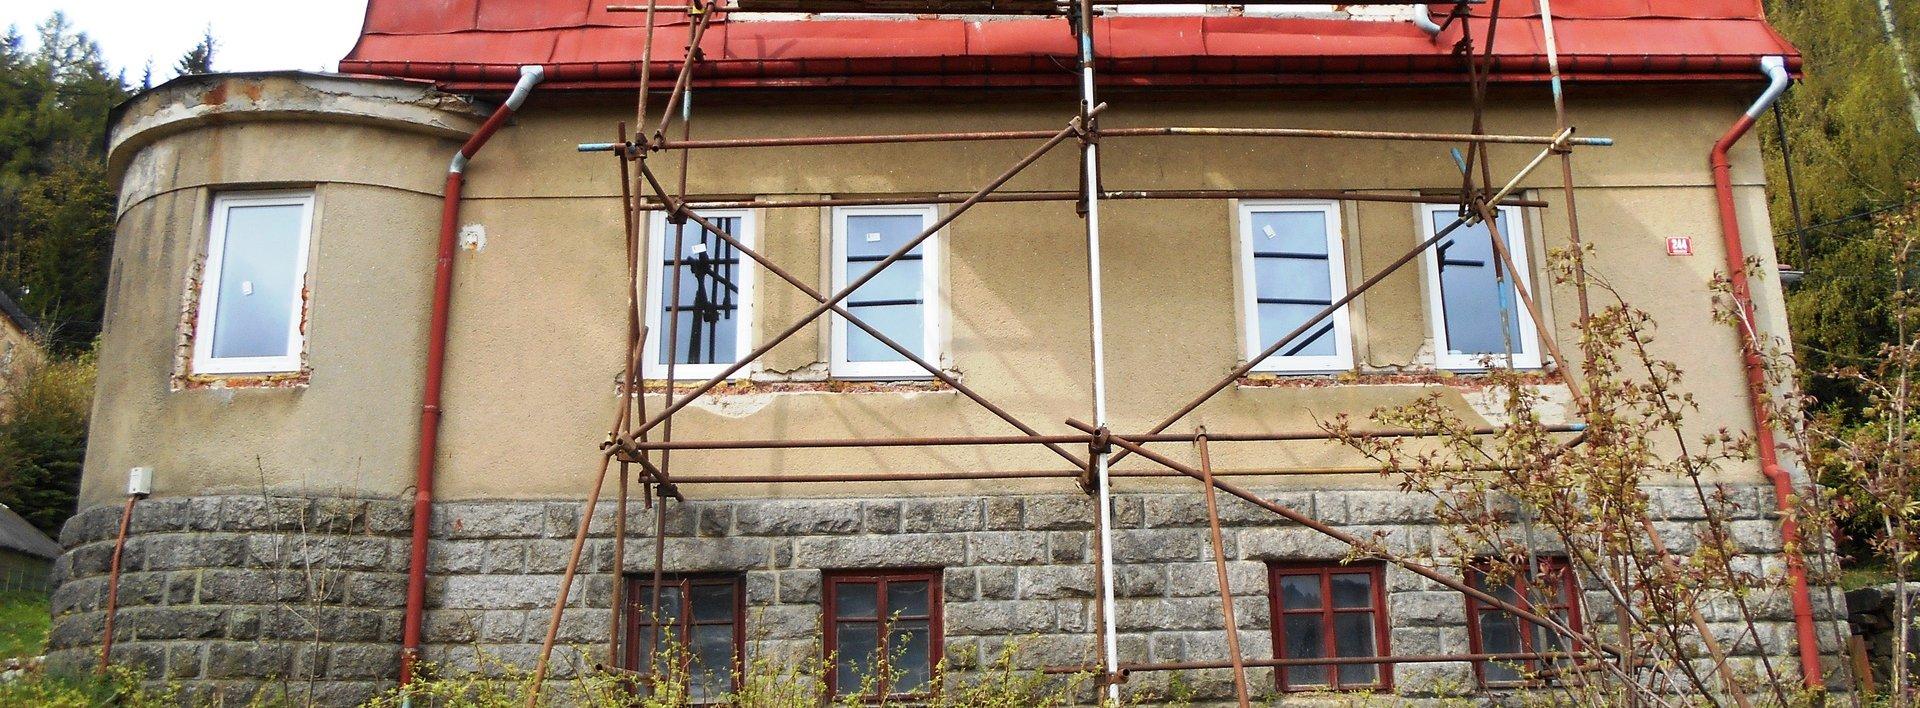 Prodej rodinného domu v rekonstrukci v Hraničné nad Nisou, Ev.č.: N48079